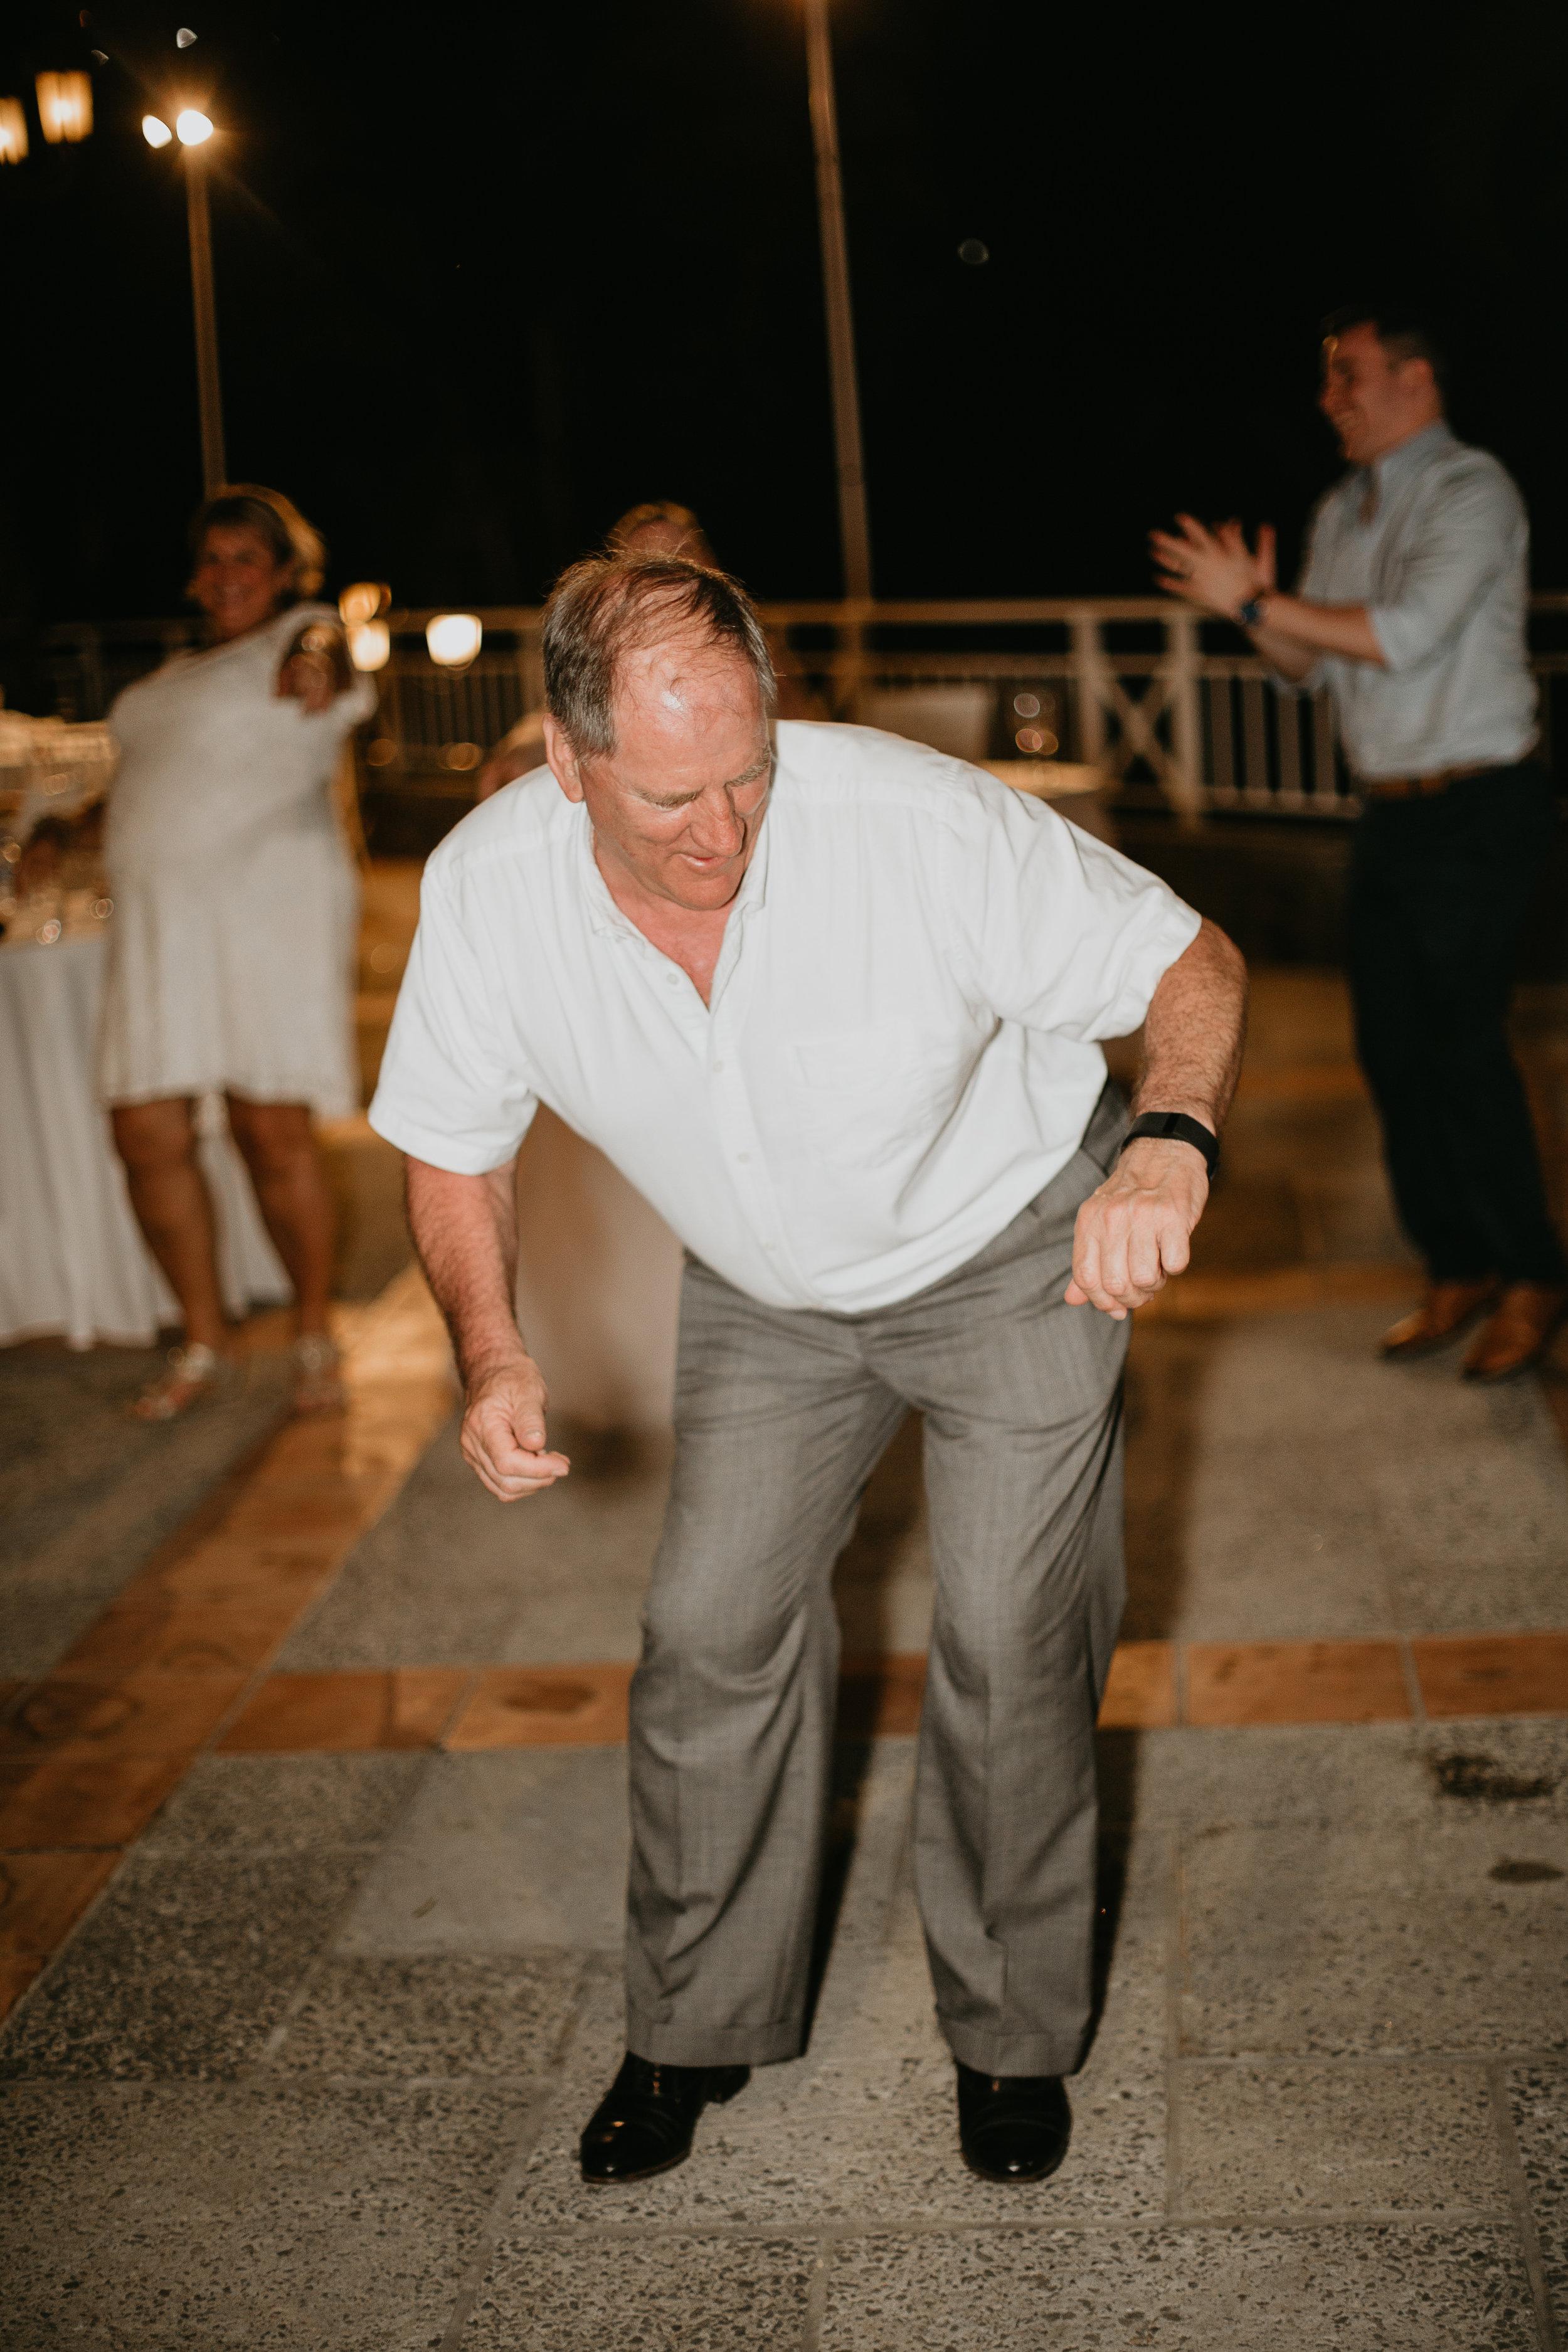 nicole-daacke-photography-destination-wedding-in-st-lucia-sandals-la-toc-intimate-island-wedding-carribean-elopement-photographer-chill-island-wedding-172.jpg